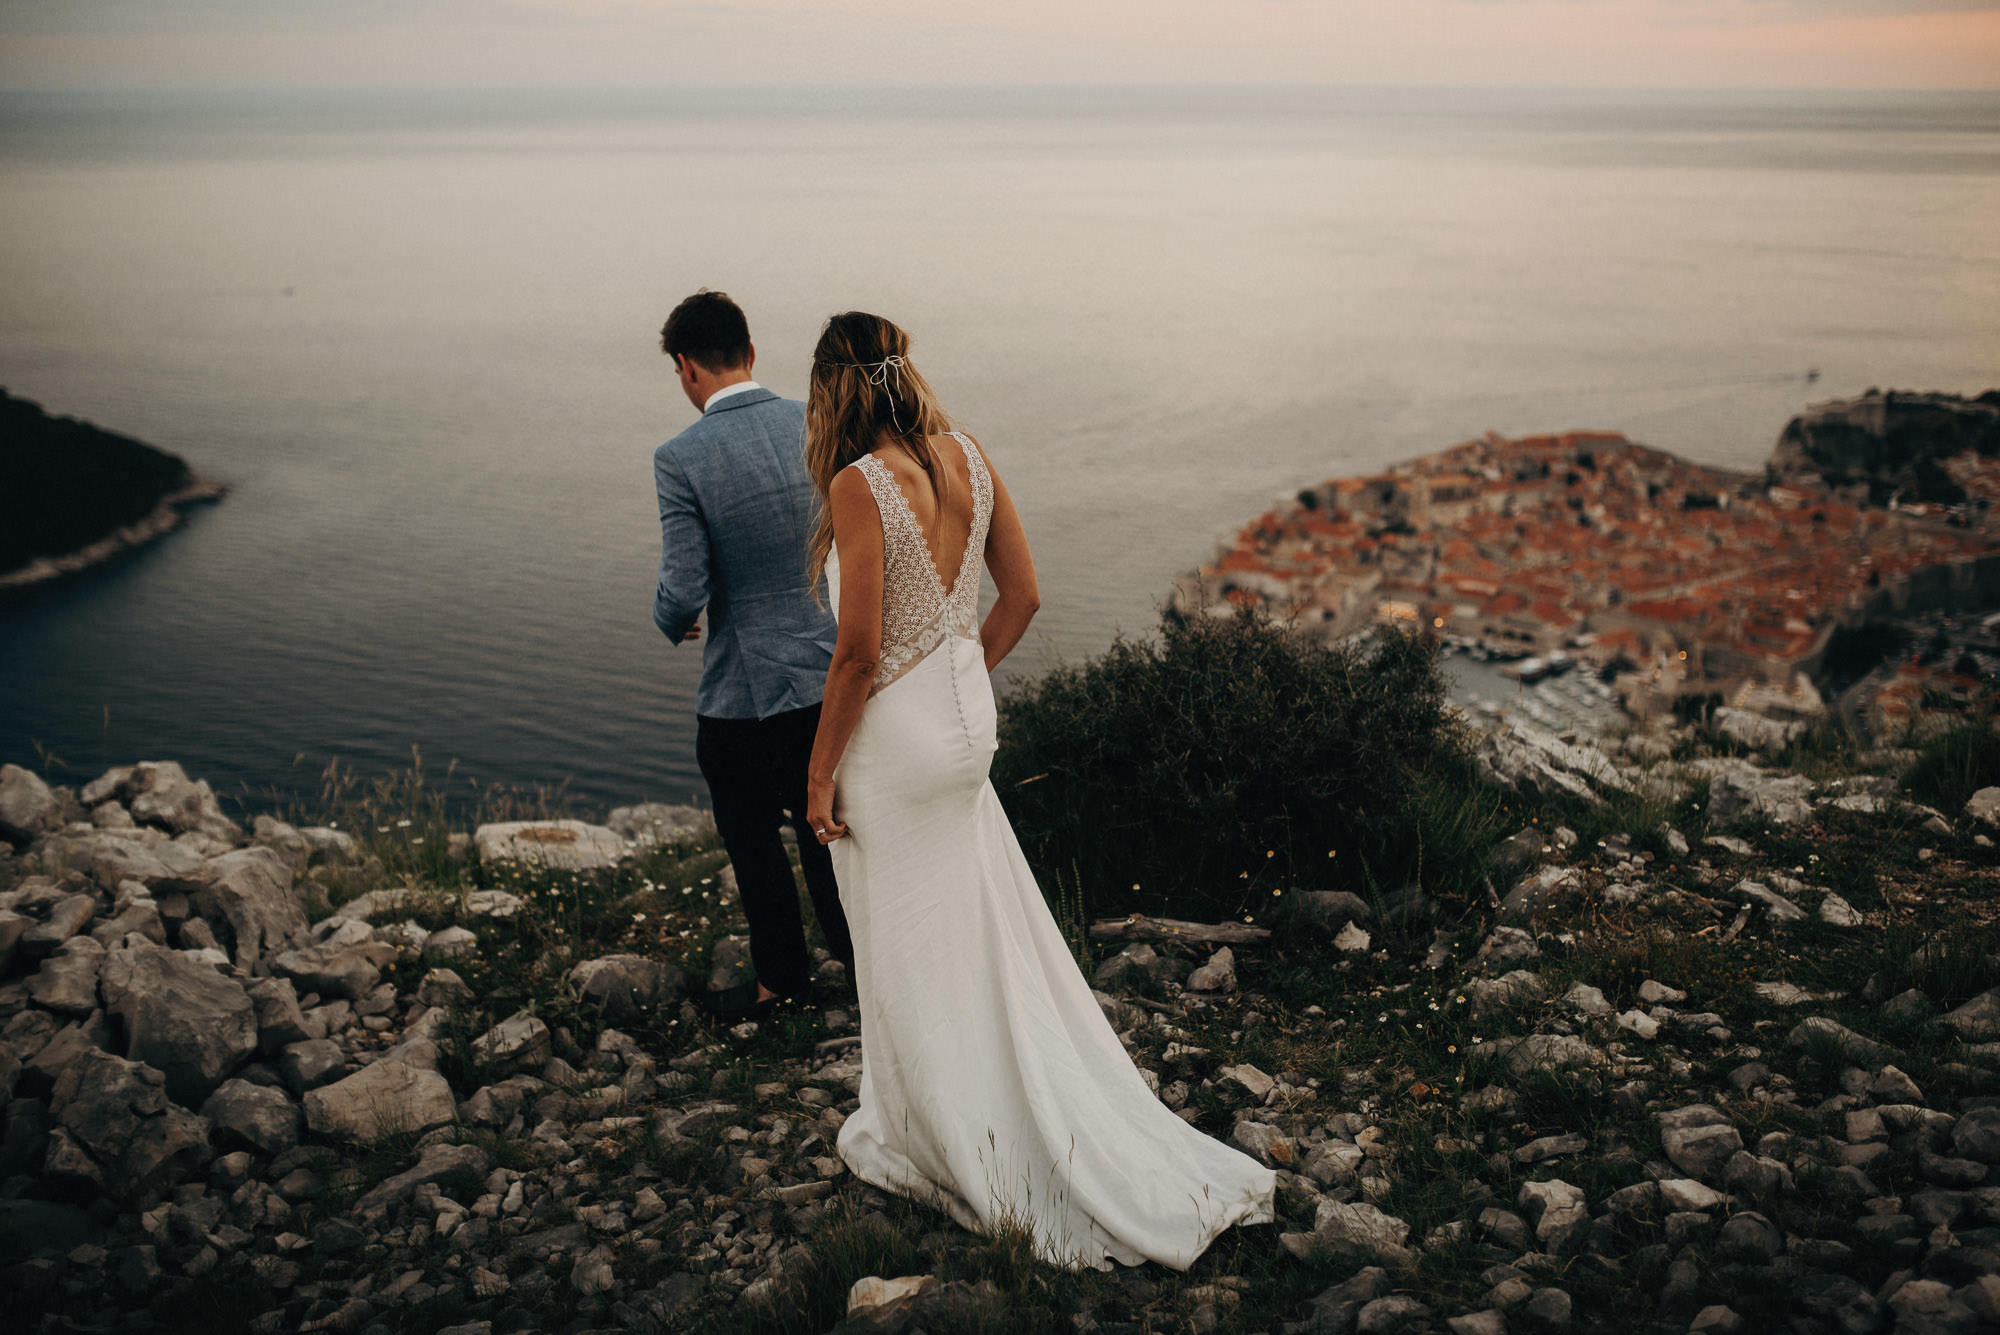 dubrovnik_croatia_wedding_photographer-jere_satamo-destination_weddings-120-web.jpg